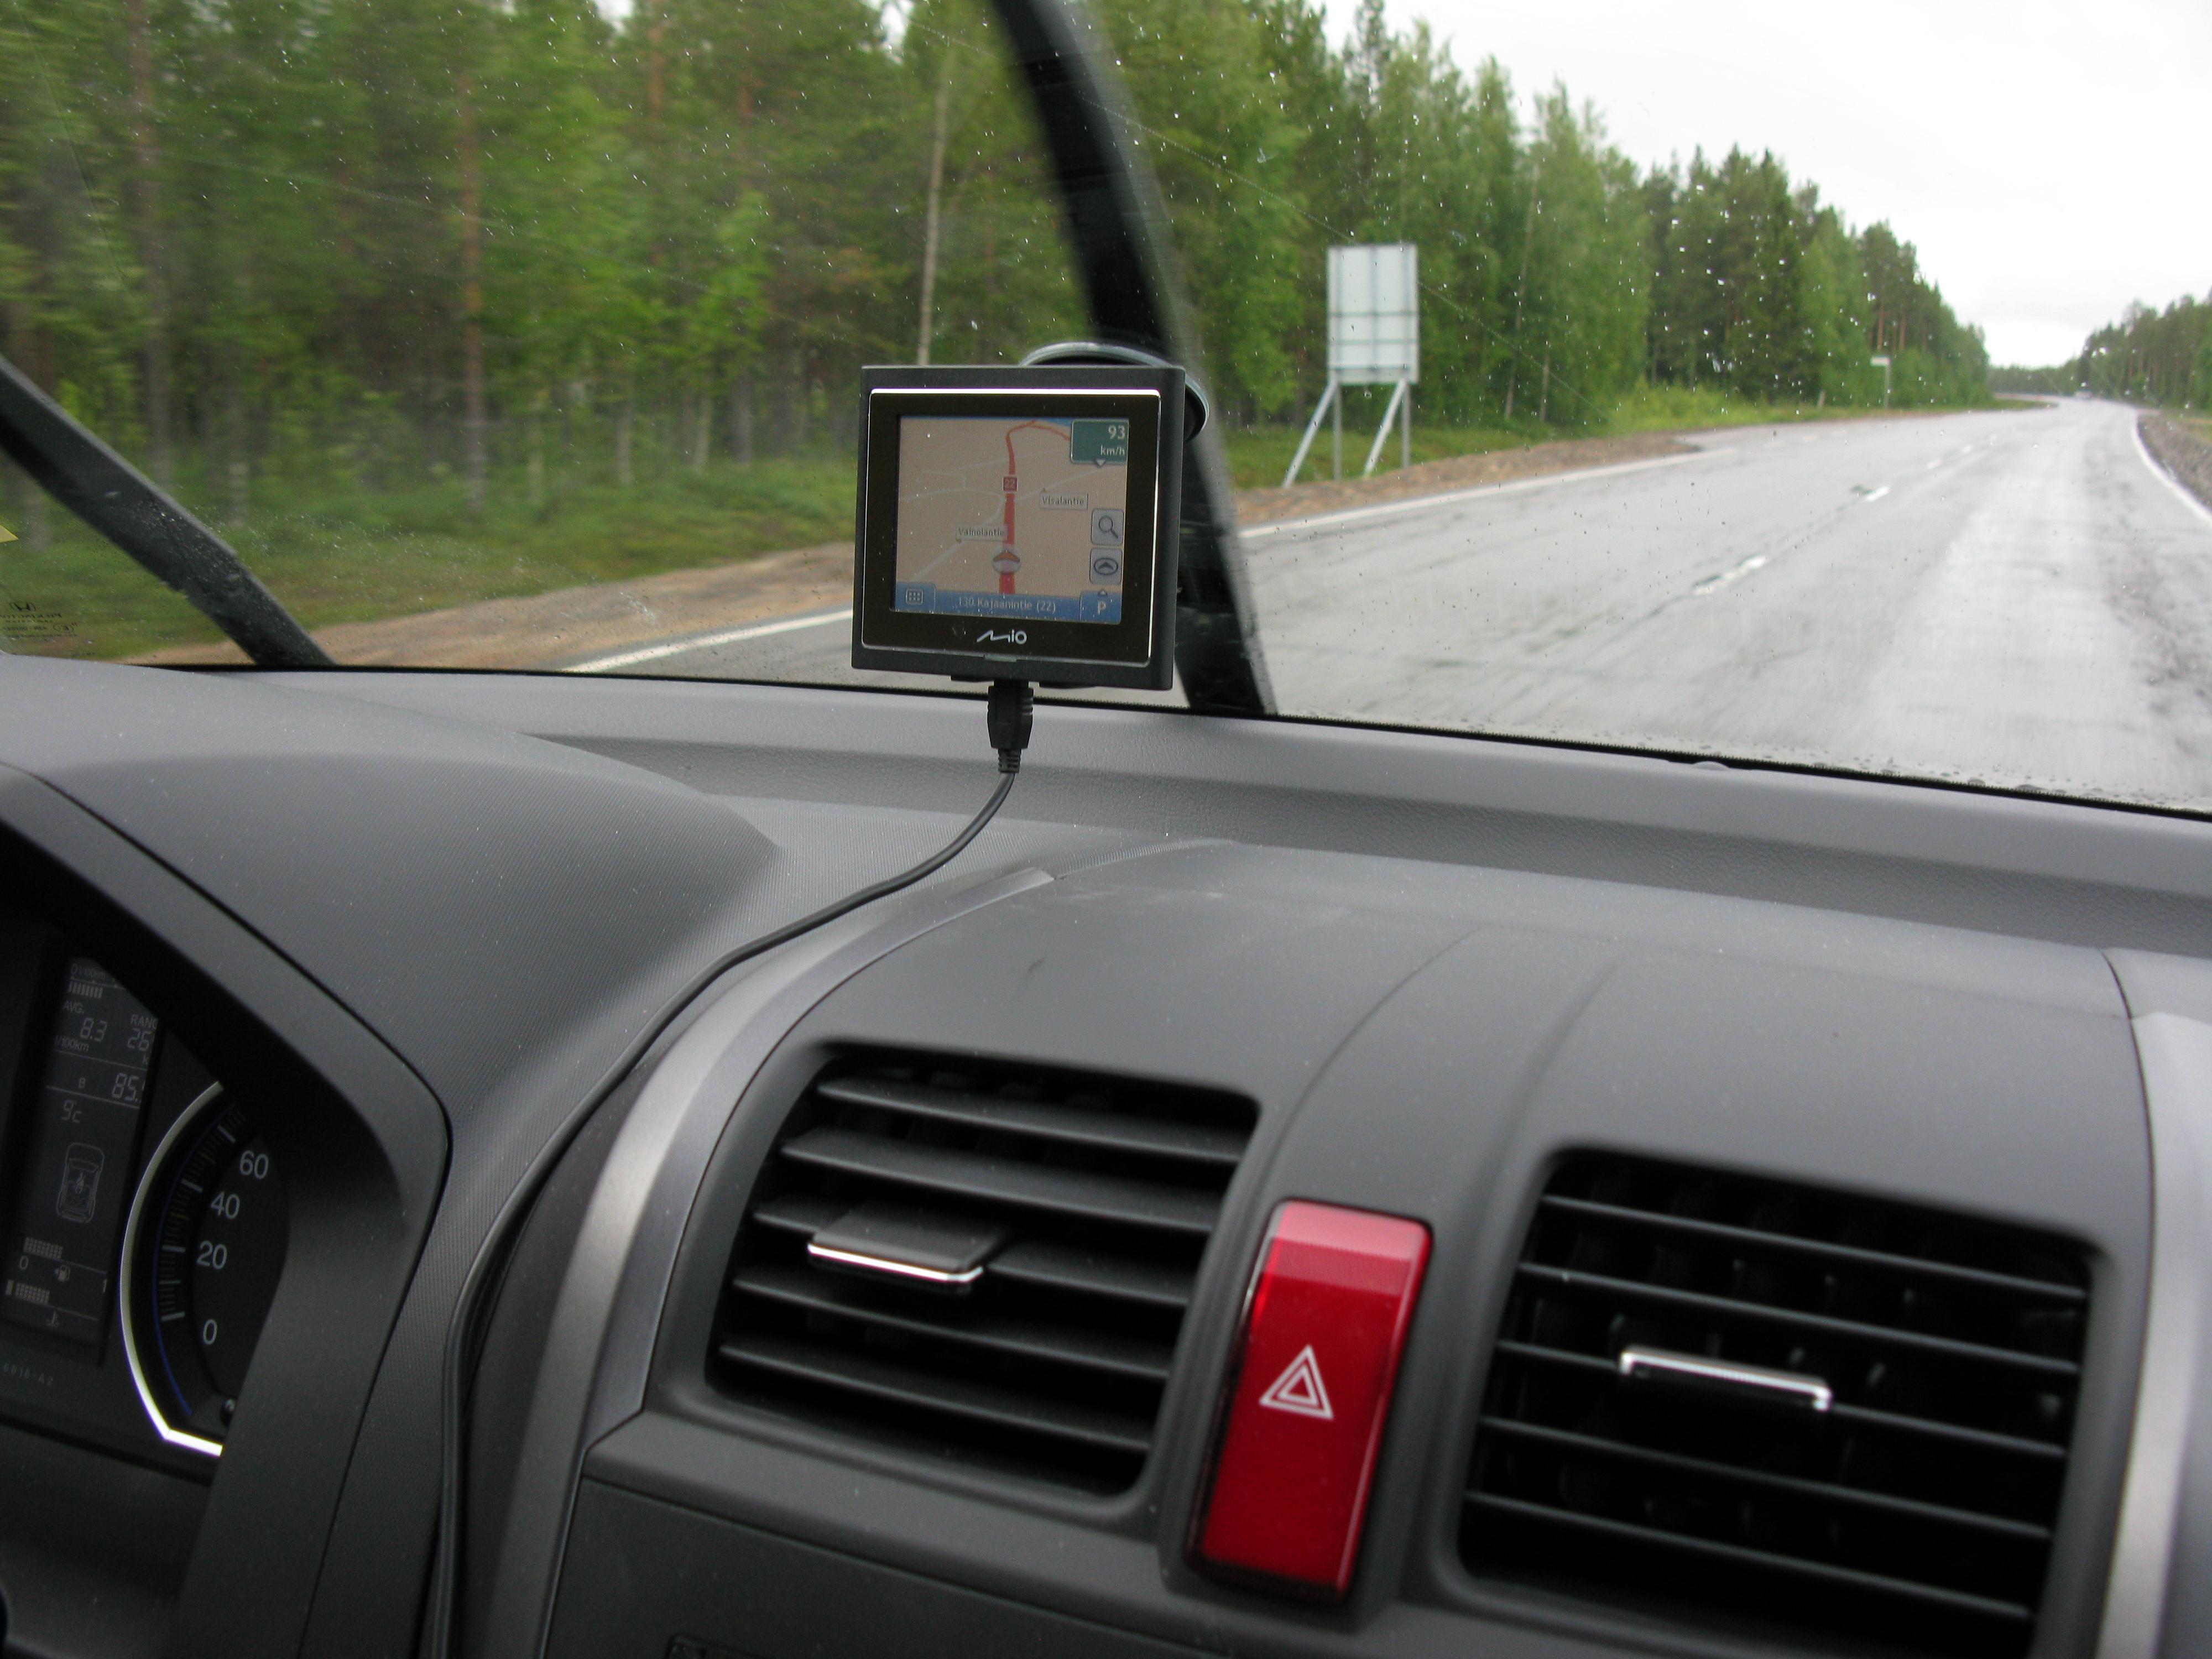 Description Car navigator in action JPG